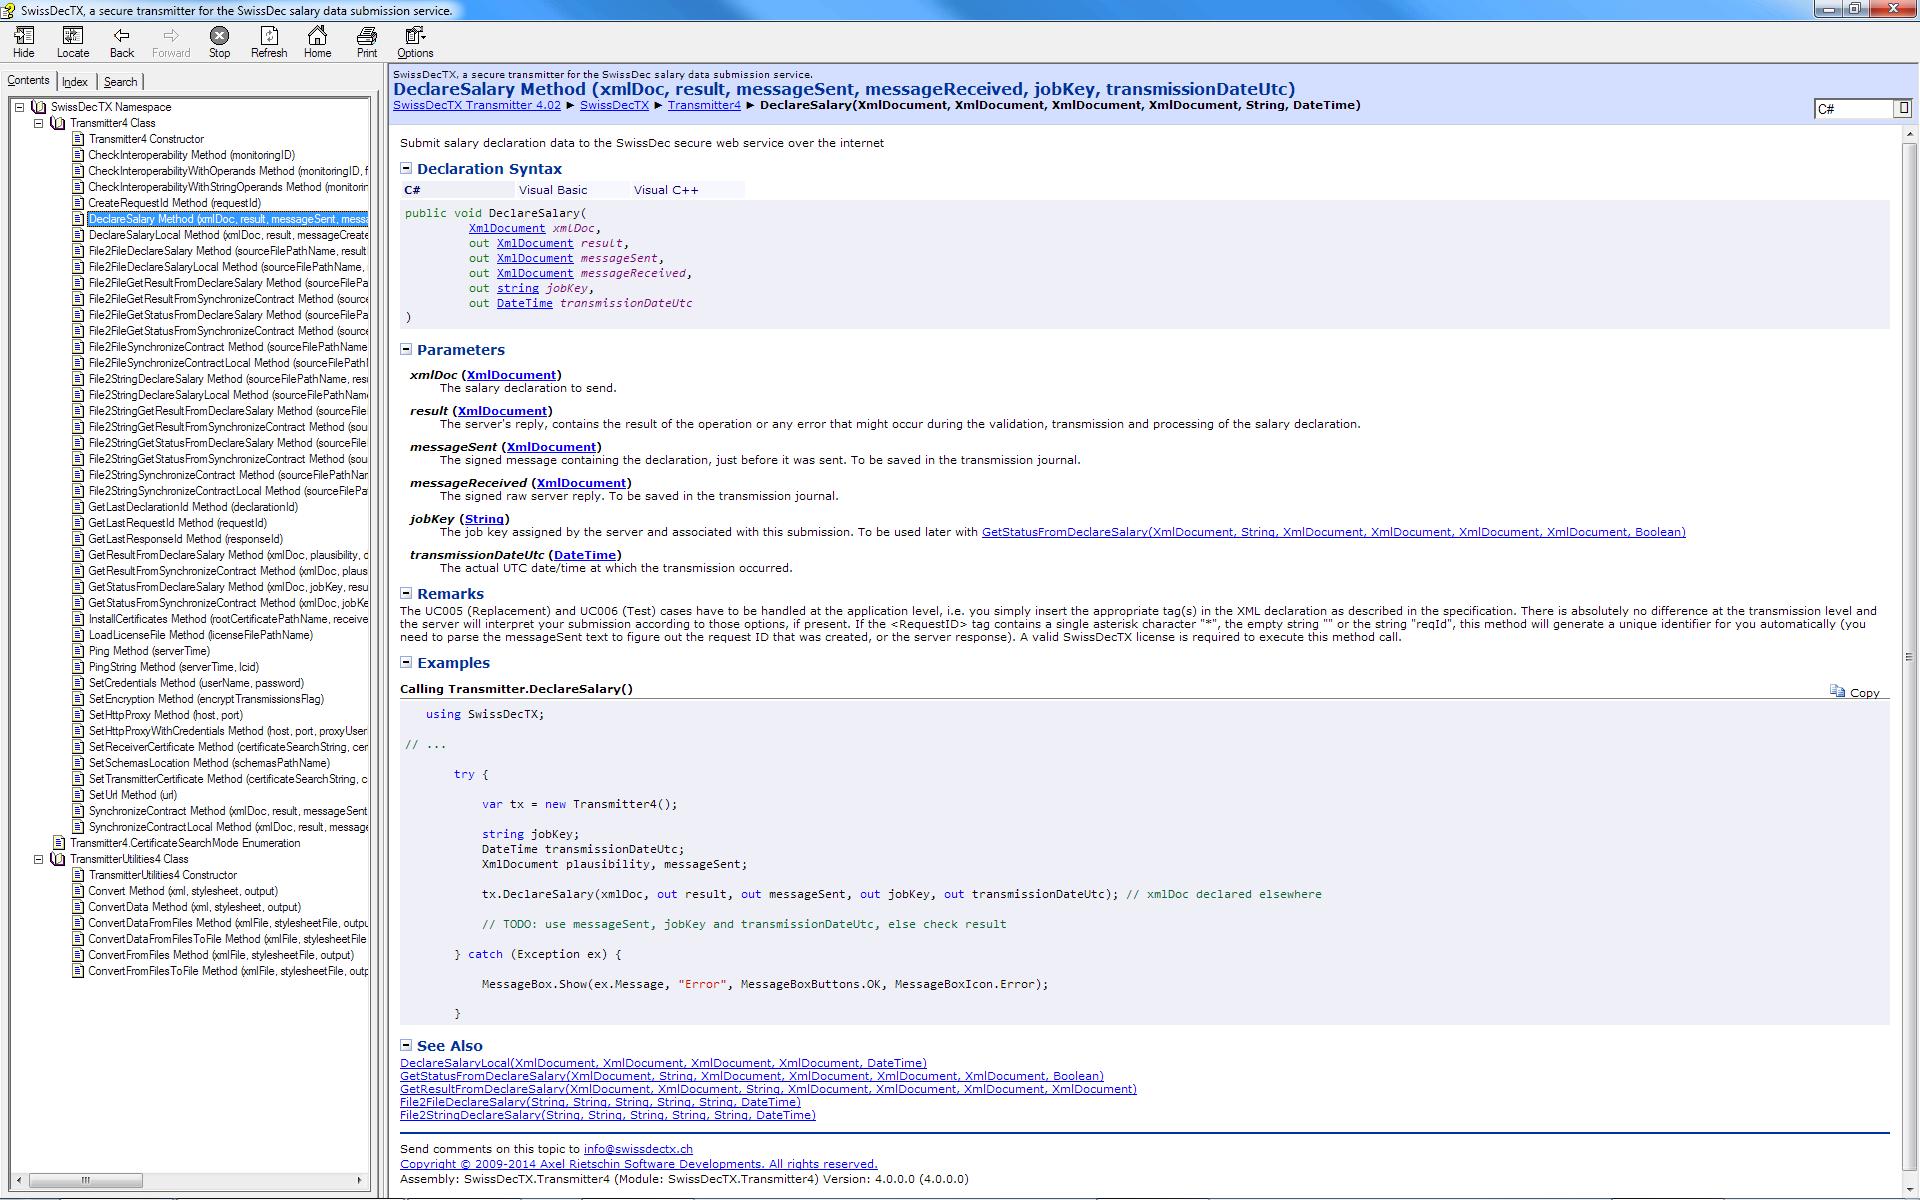 Screenshot of the programmer's help file (API documentation)